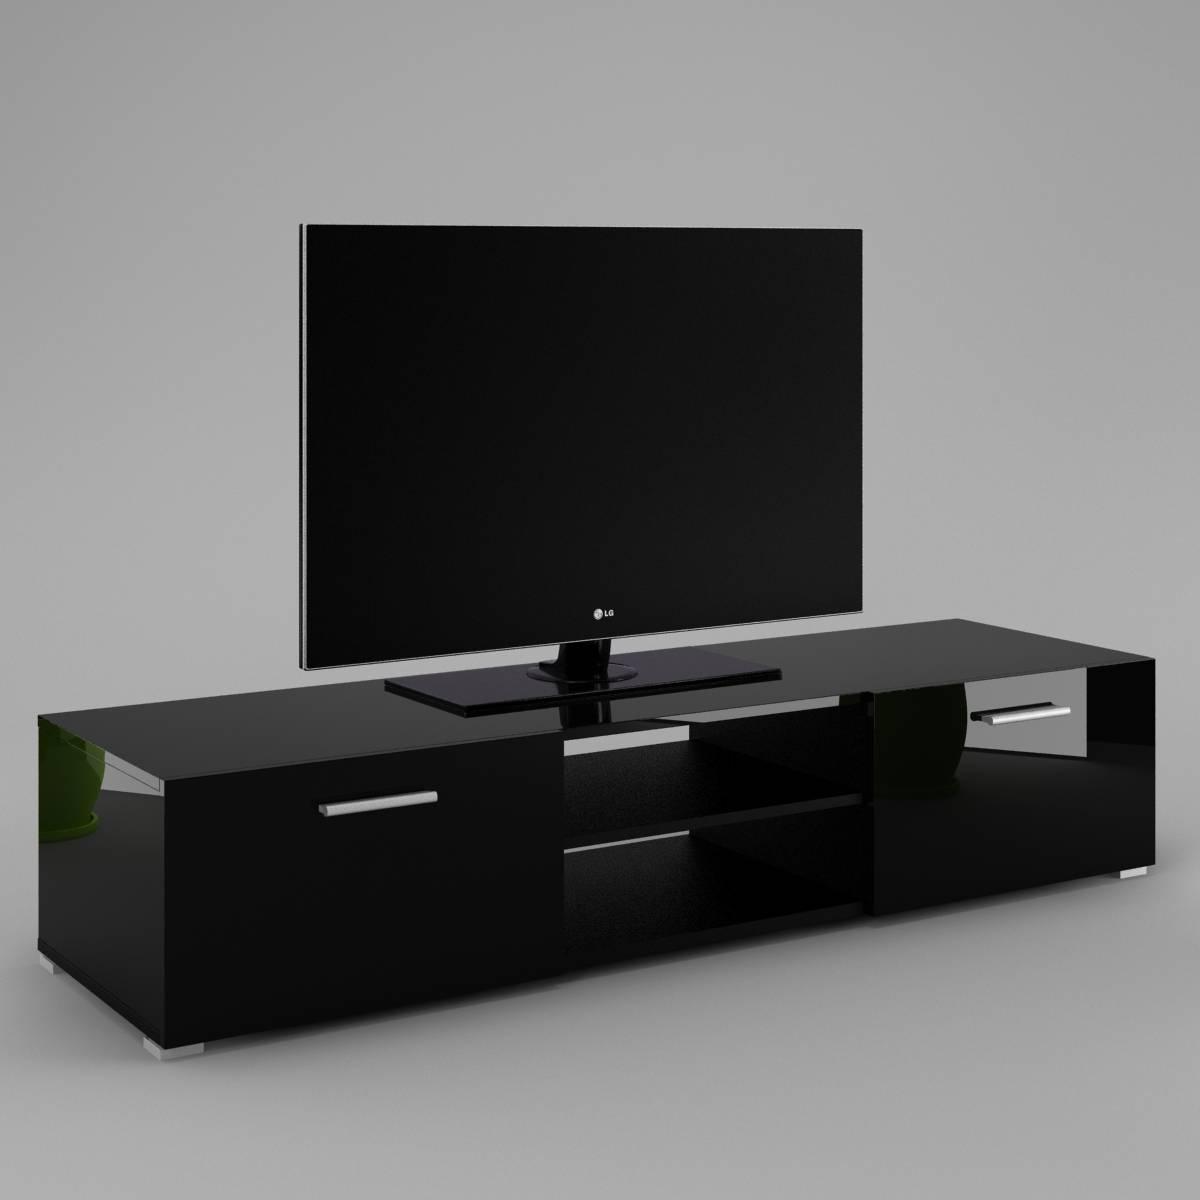 Tv Cabinet Luna - Labi Furniturelabi Furniture with regard to Black High Gloss Corner Tv Unit (Image 11 of 15)